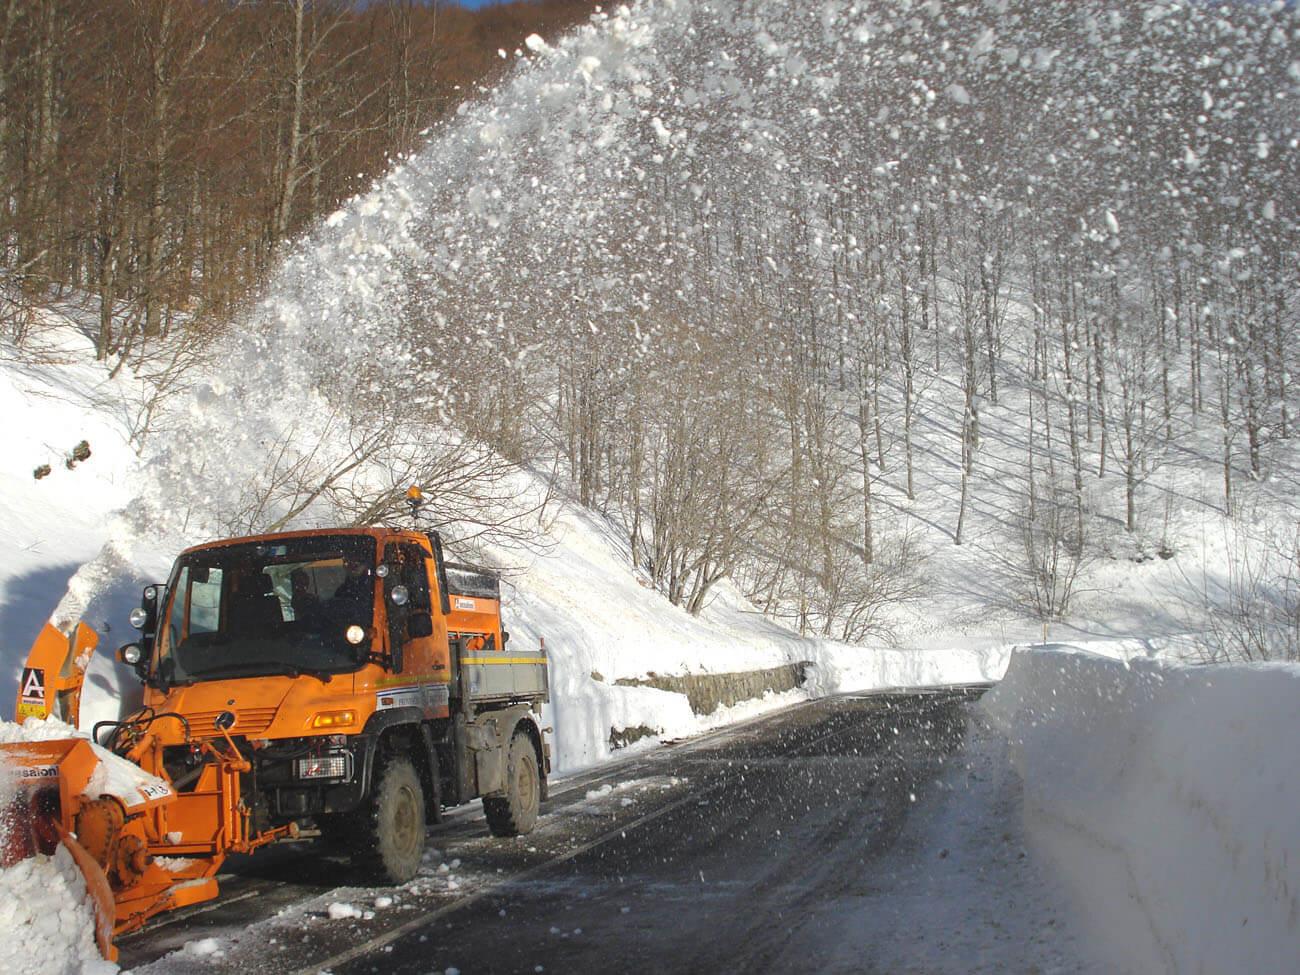 Emergenza neve: ancora disagi in Garfagnana e sulla montagna pistoiese